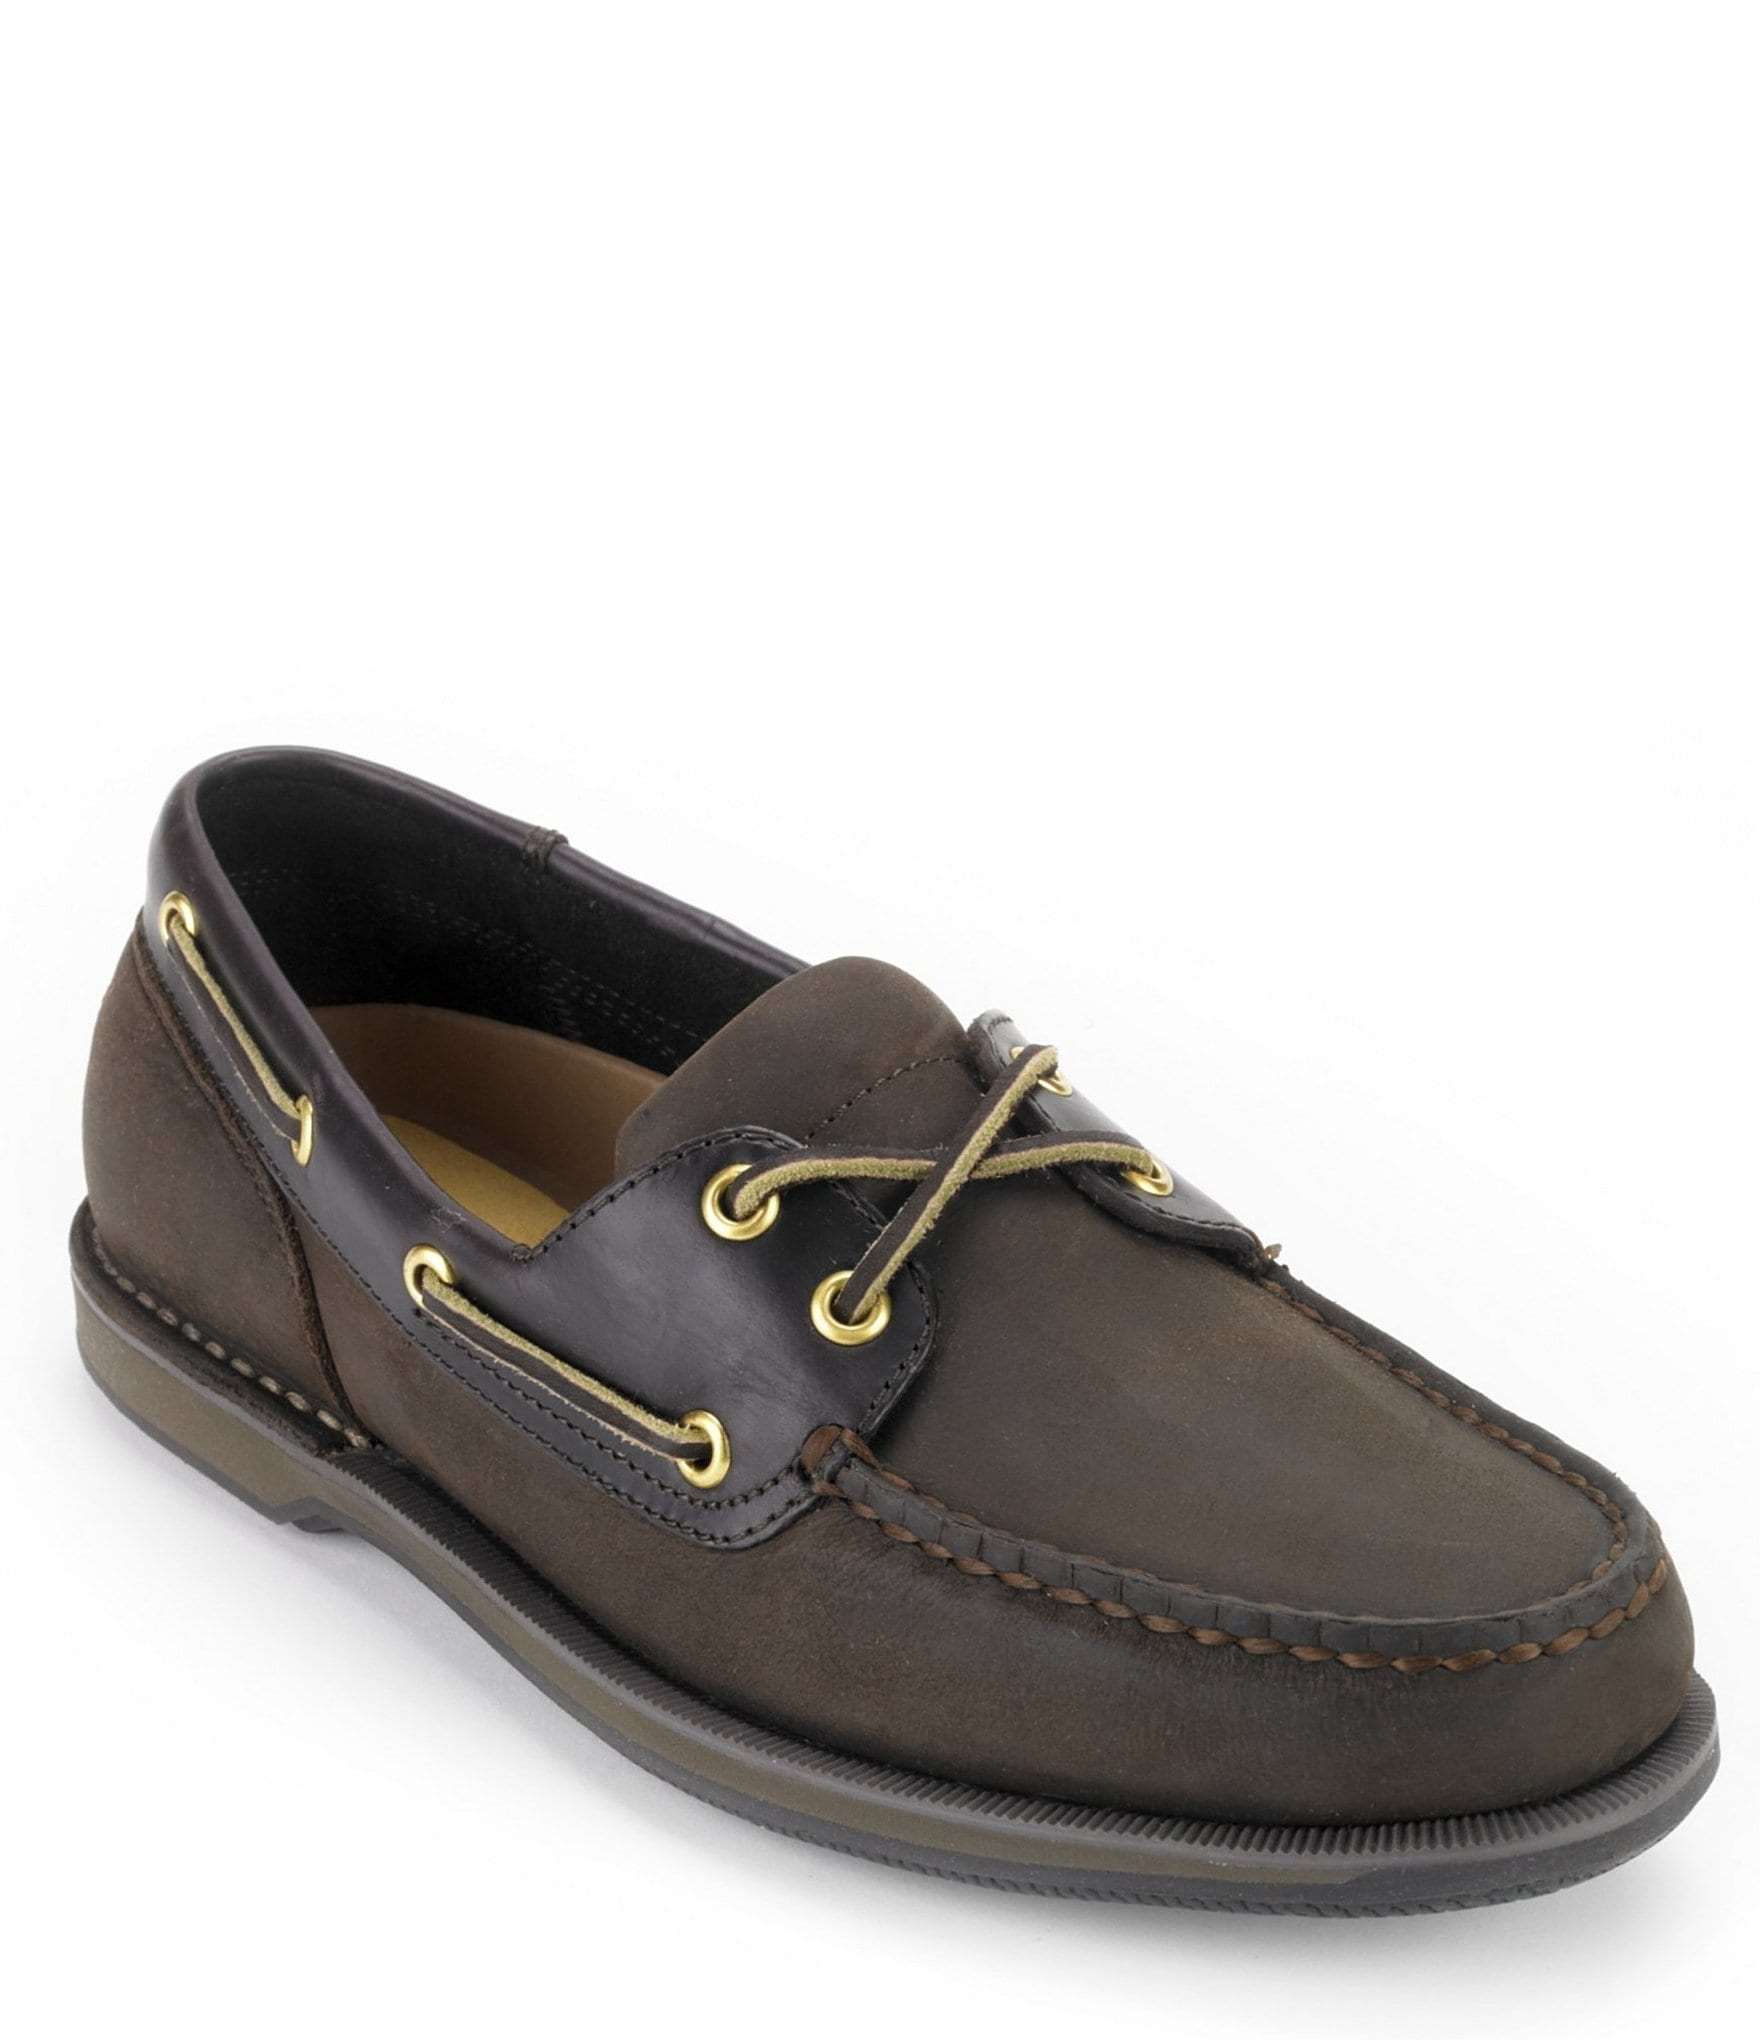 Dillards Rockport Women S Shoes